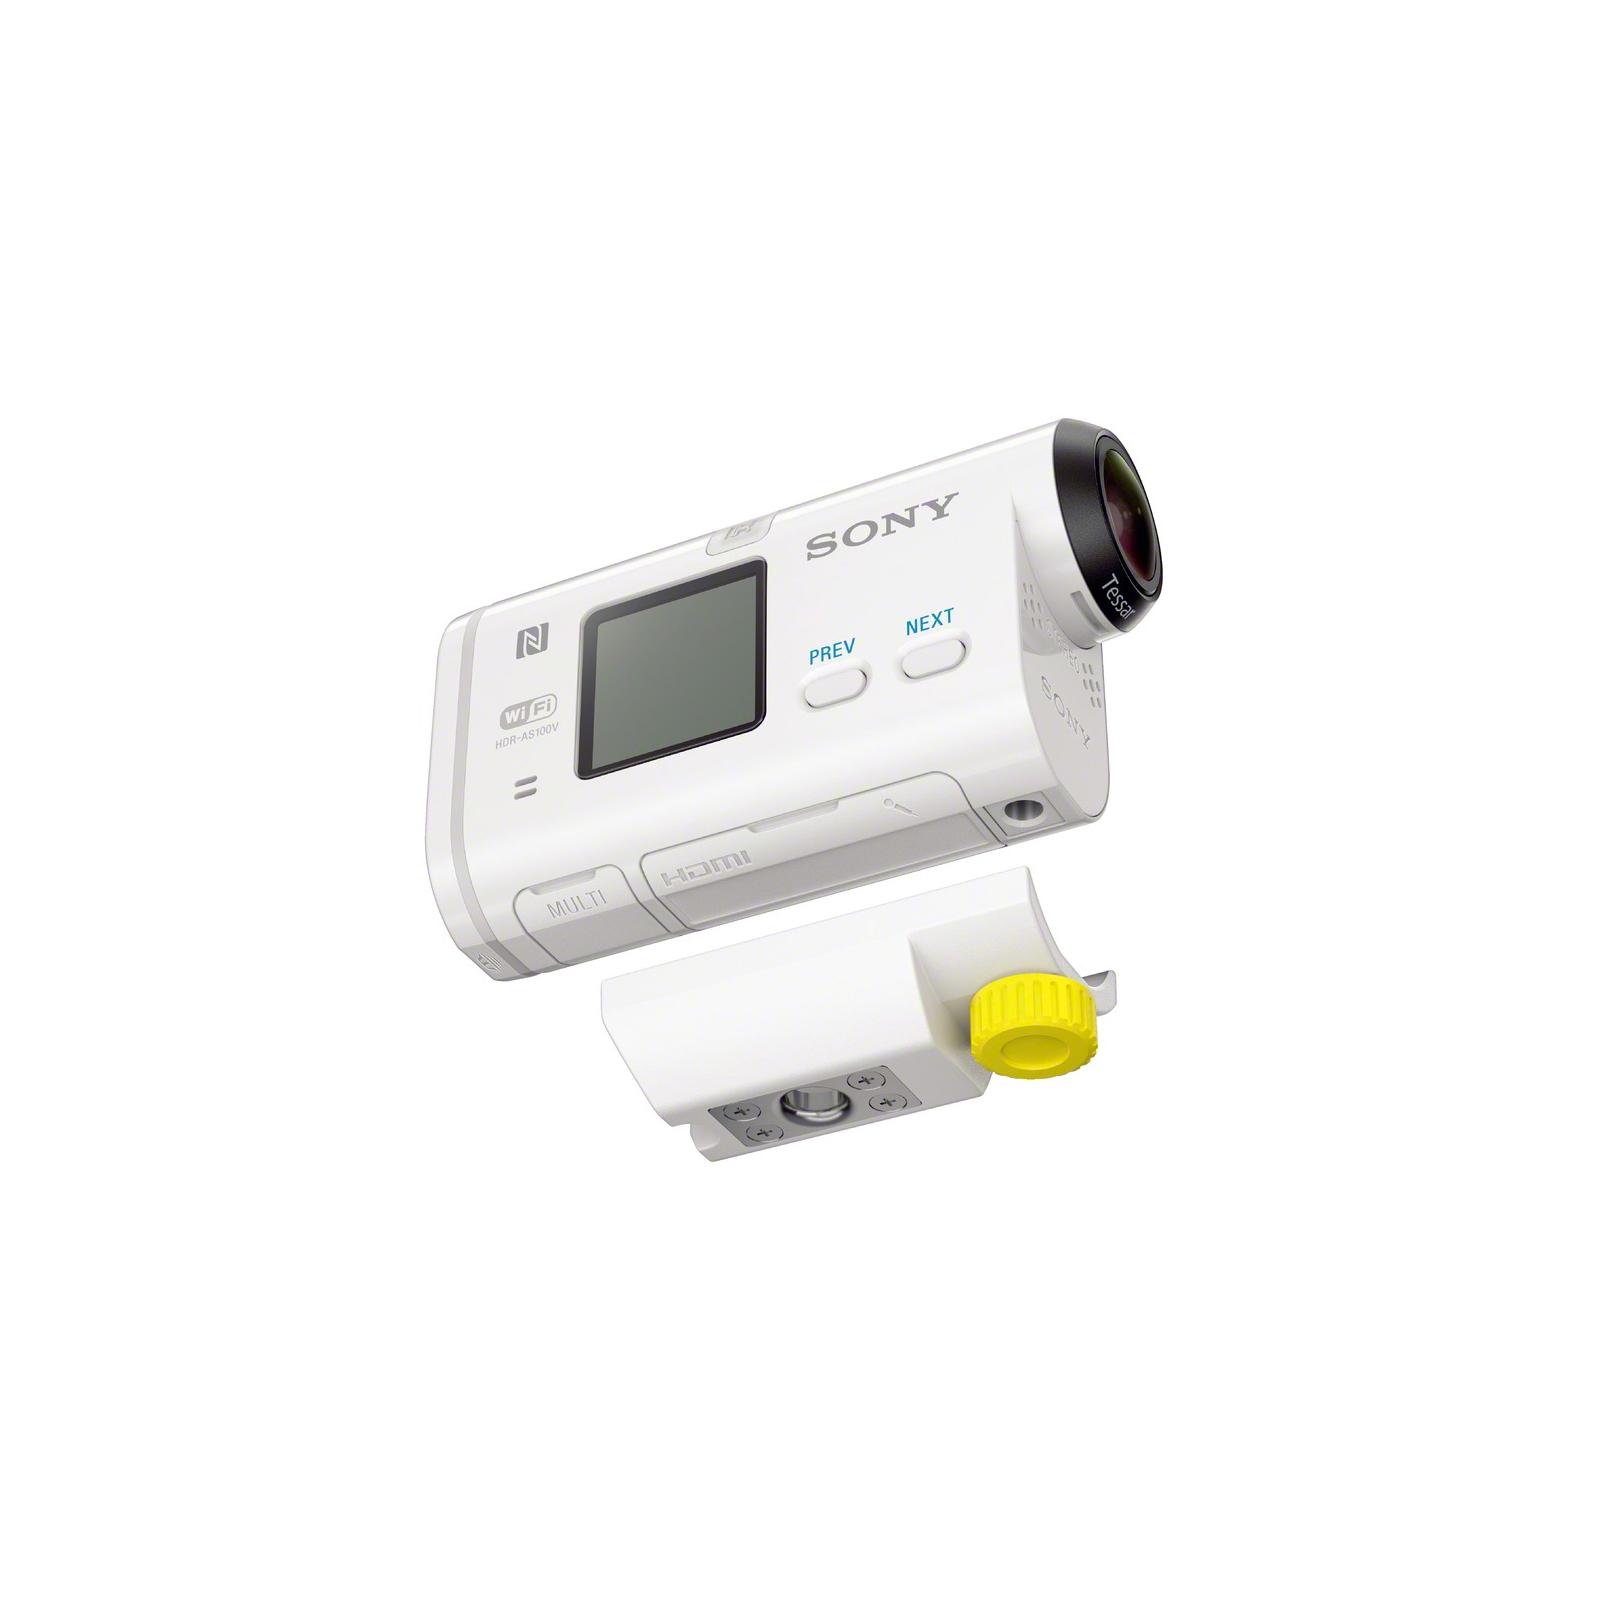 Экшн-камера SONY HDR-AS100V w/mount kit (HDRAS100VW.CEN) изображение 7